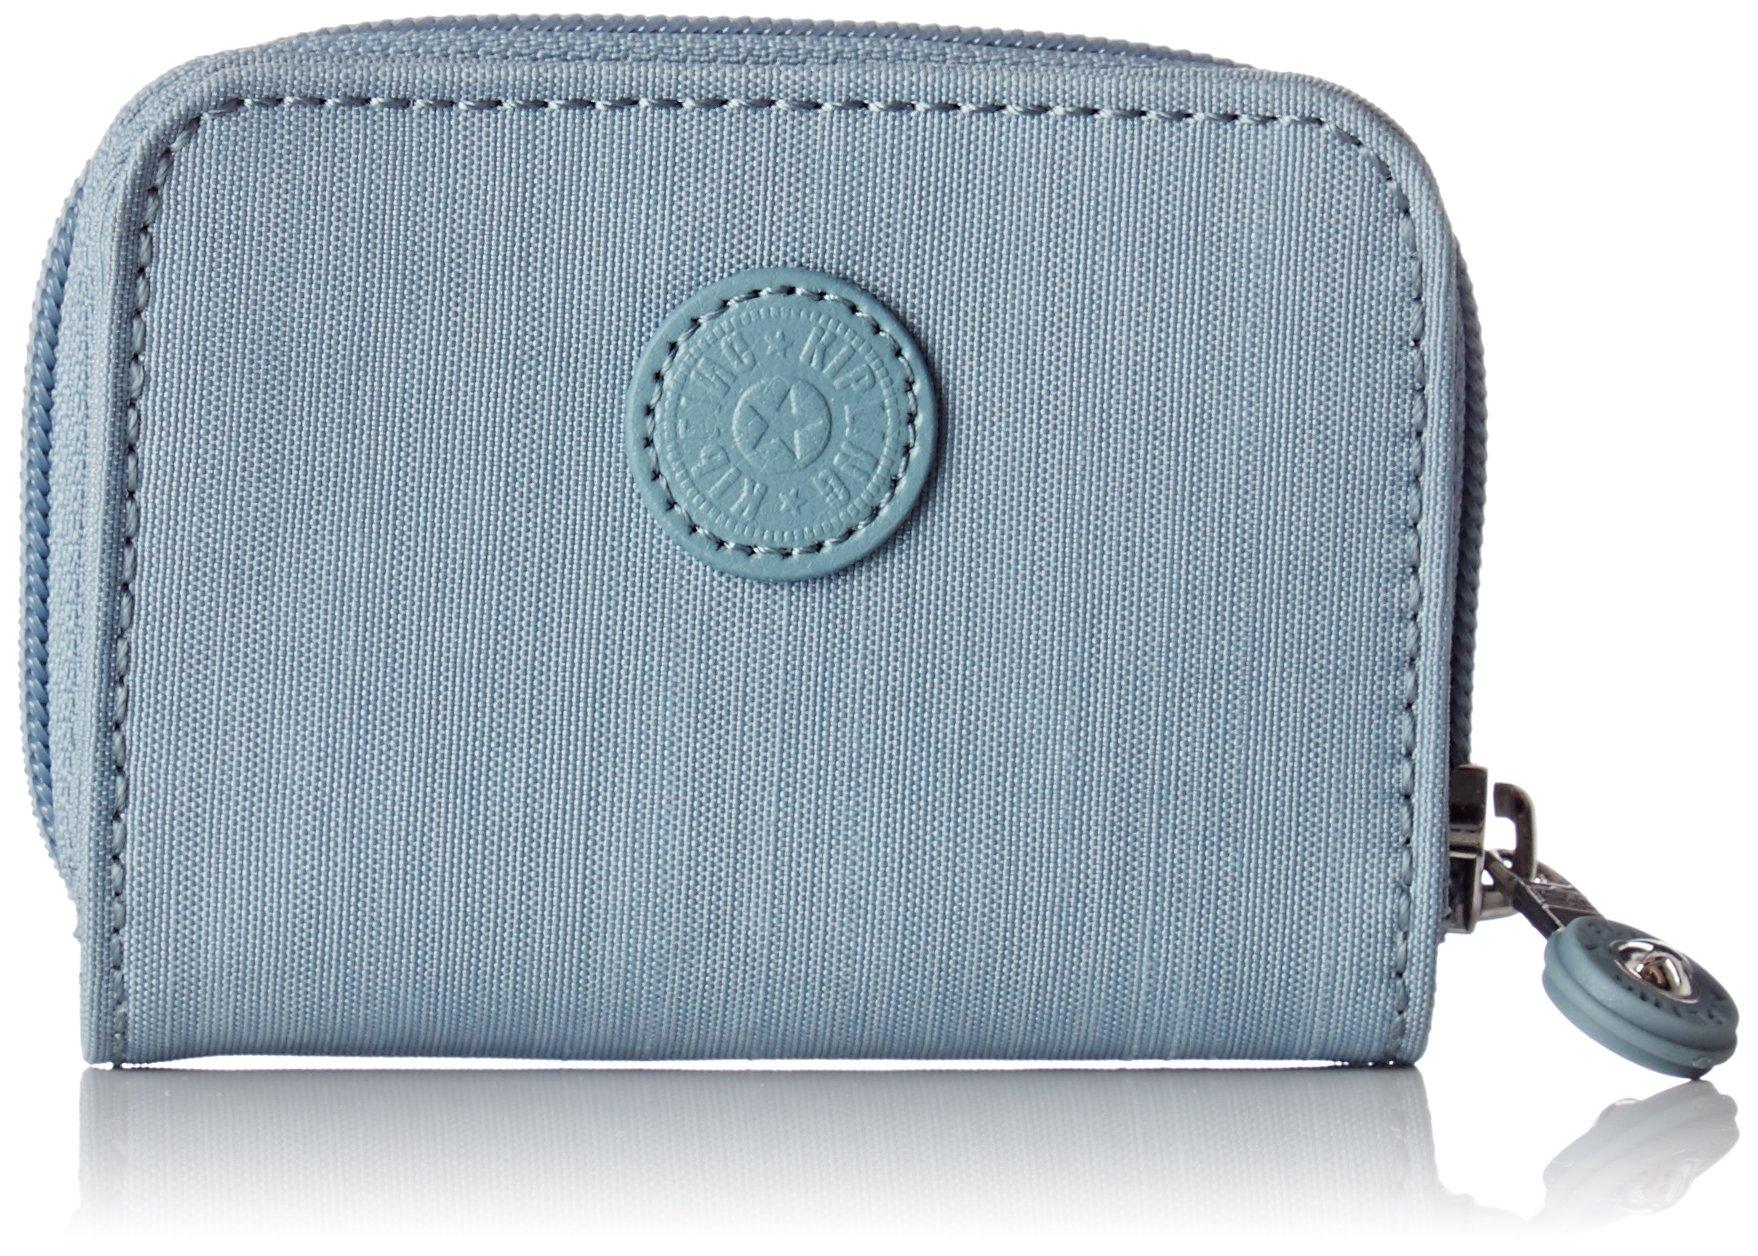 Kipling Tops, Women's Wallet, Blue (Dazz Soft Aloe), 15x24x45 cm (W x H x L)